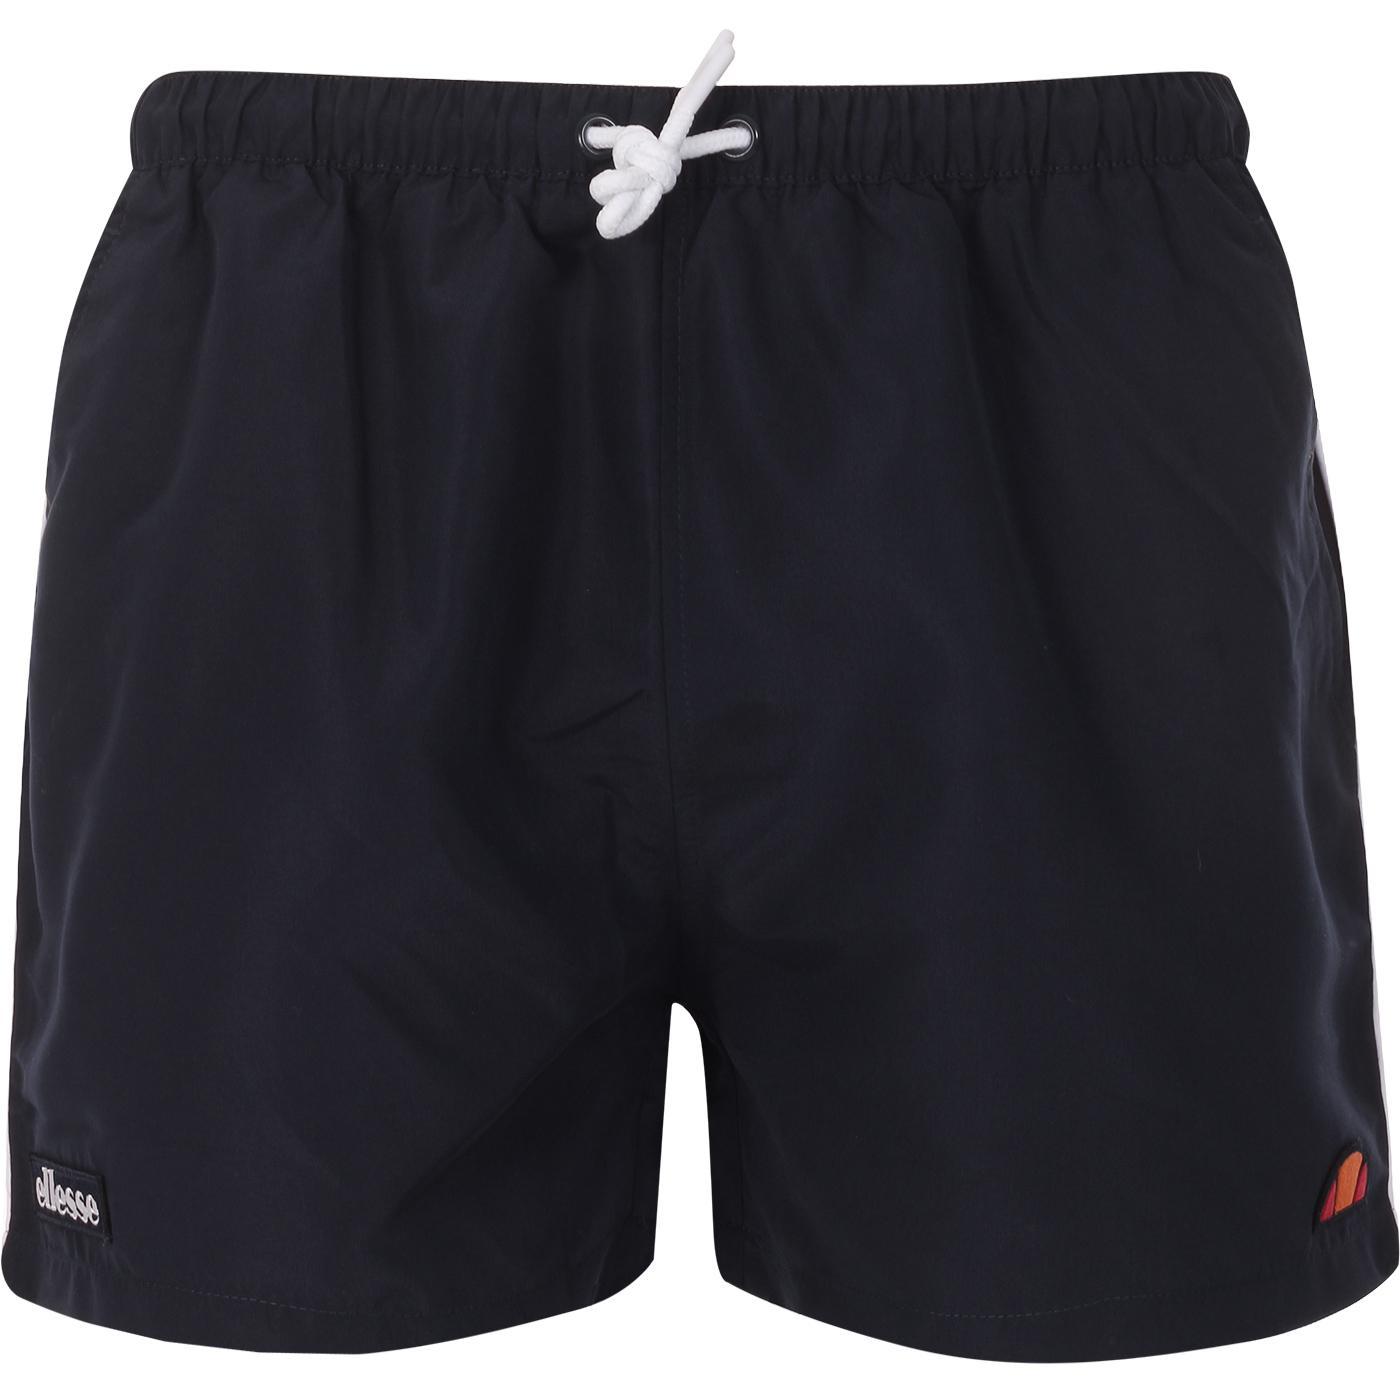 Dem Slackers ELLESSE Retro Swim Shorts (Navy)